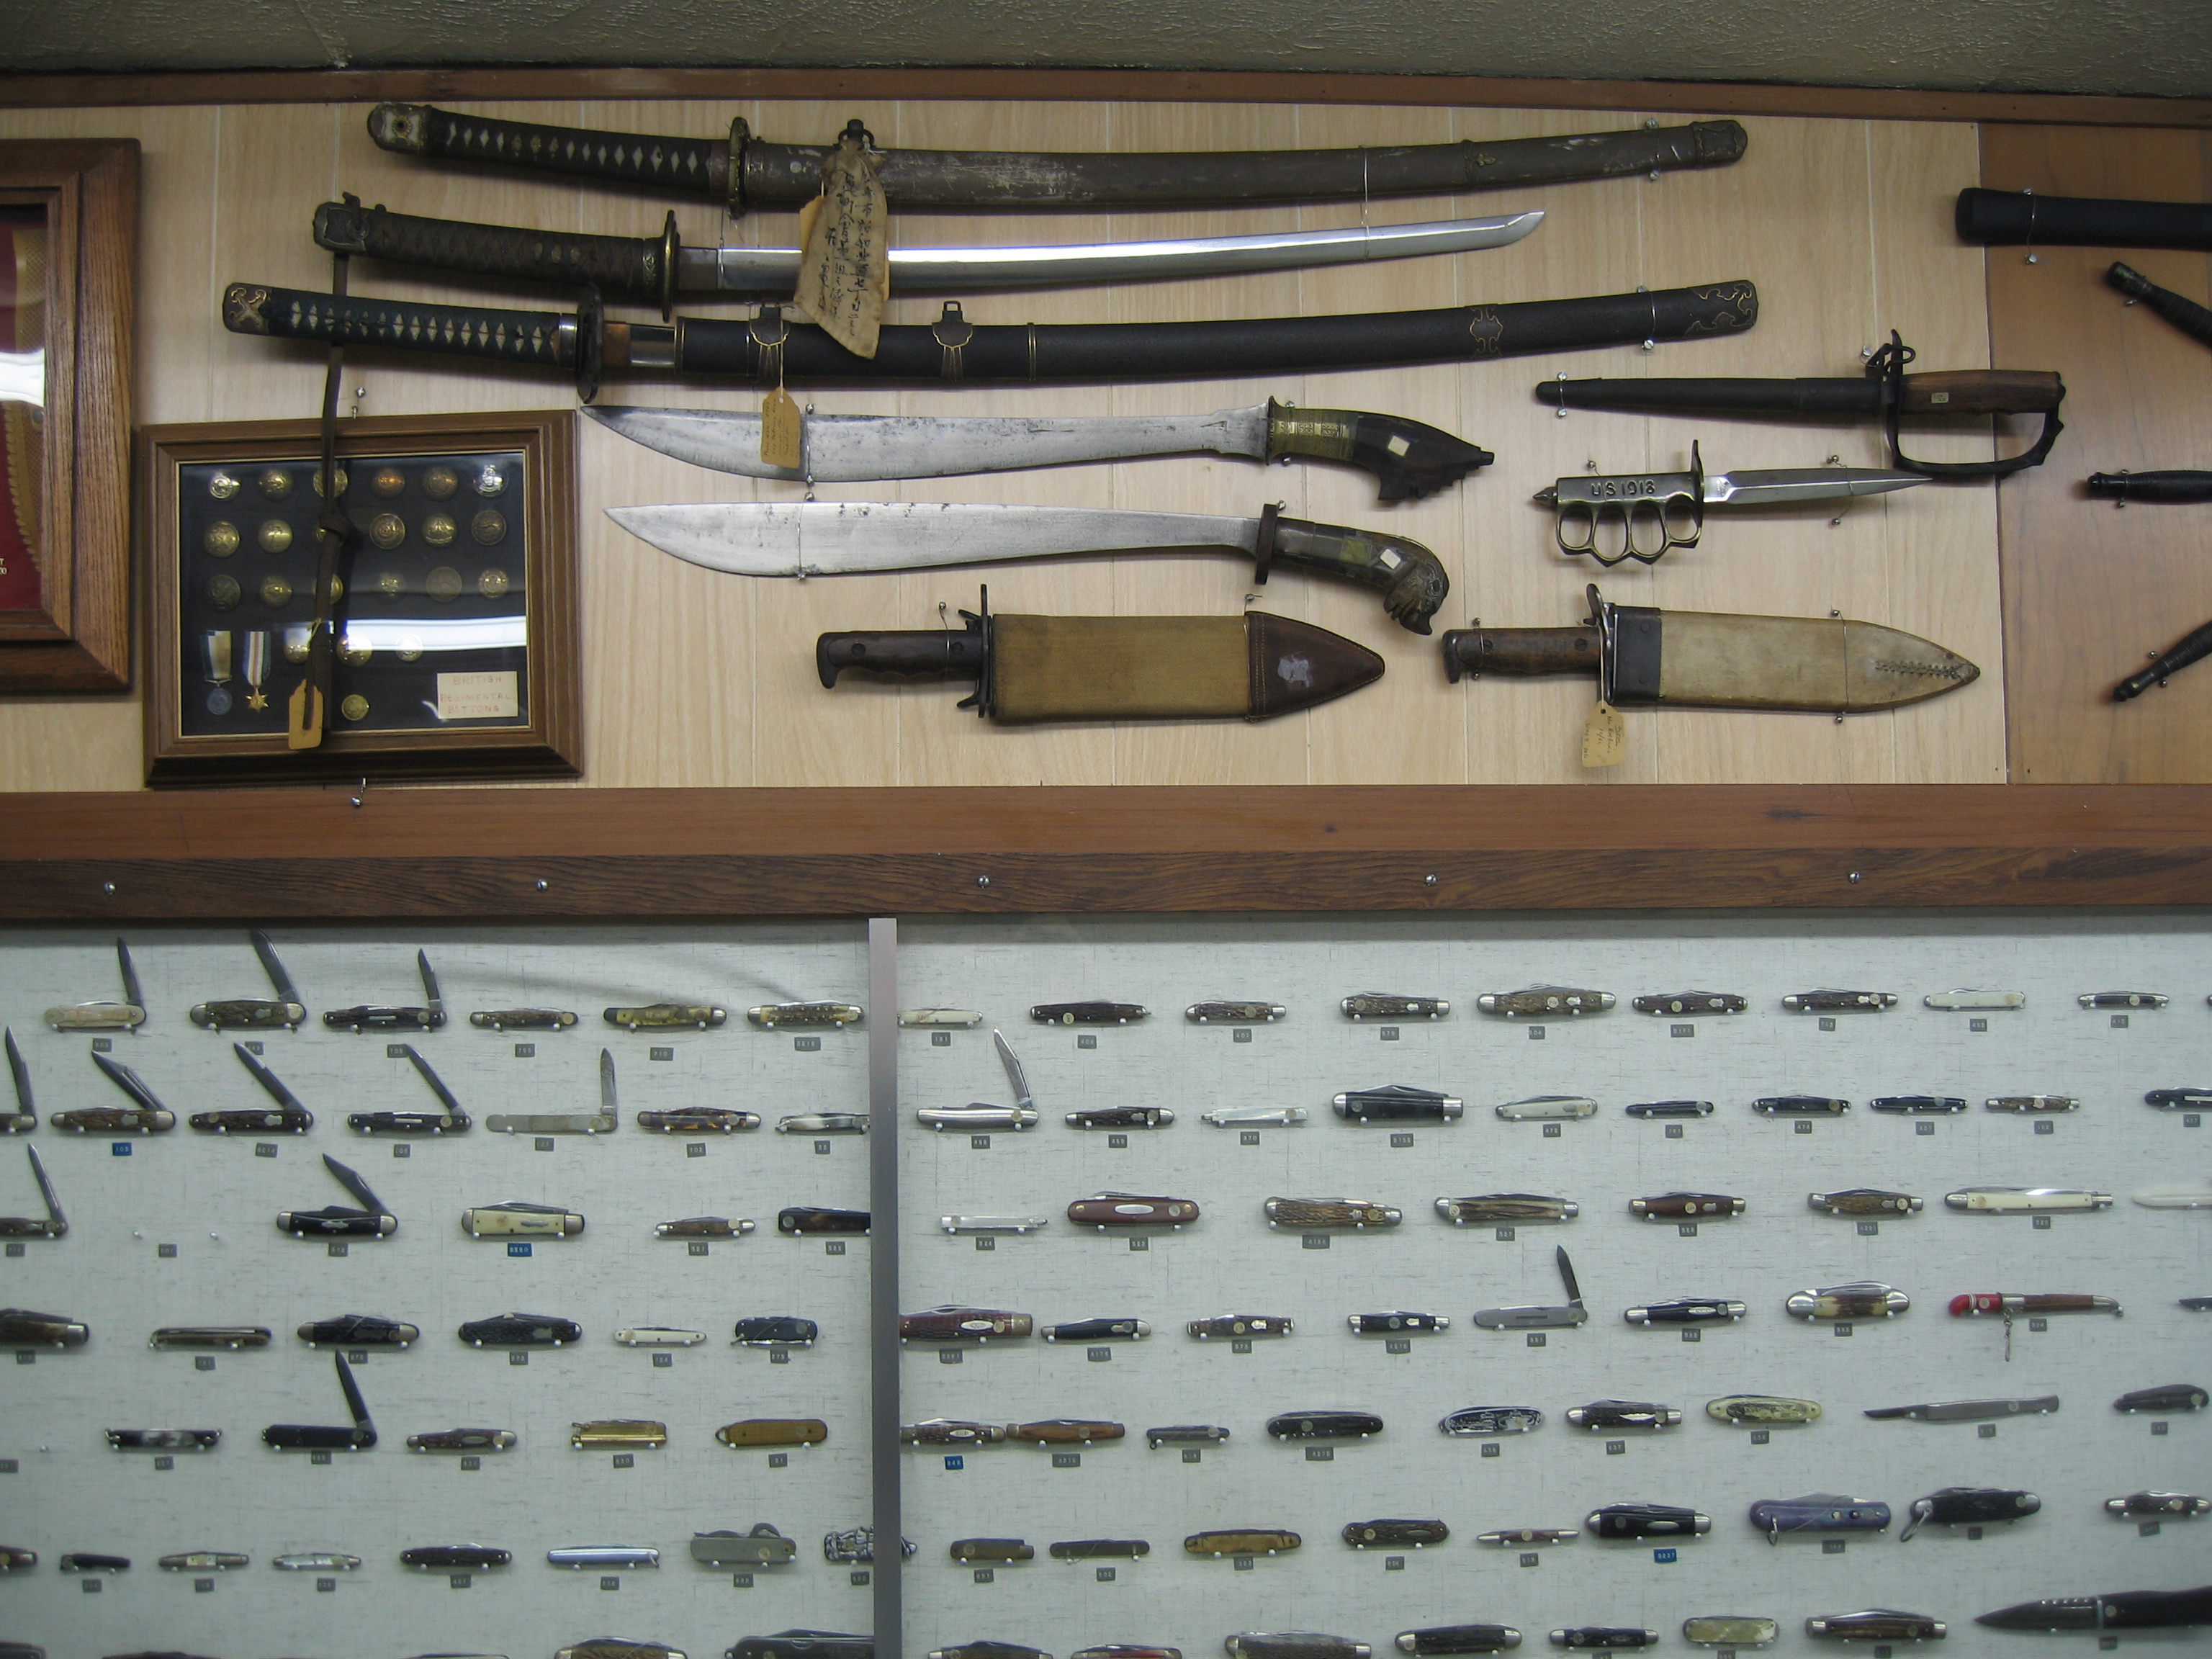 filerandall made knives museum 001jpg wikimedia commons